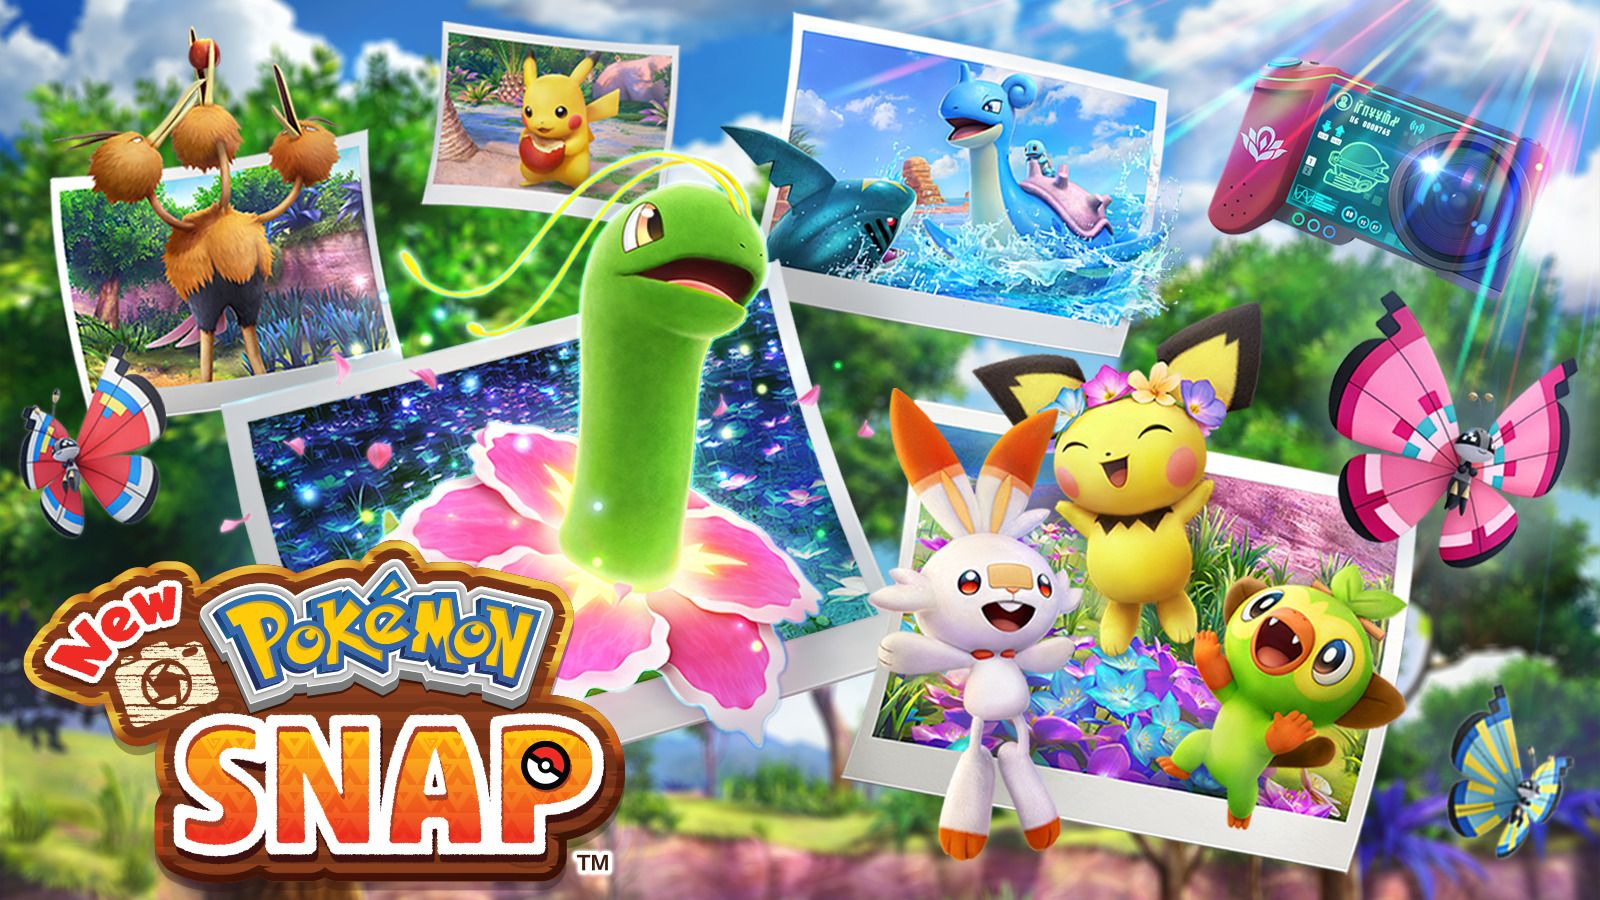 New Pokémon Snap review